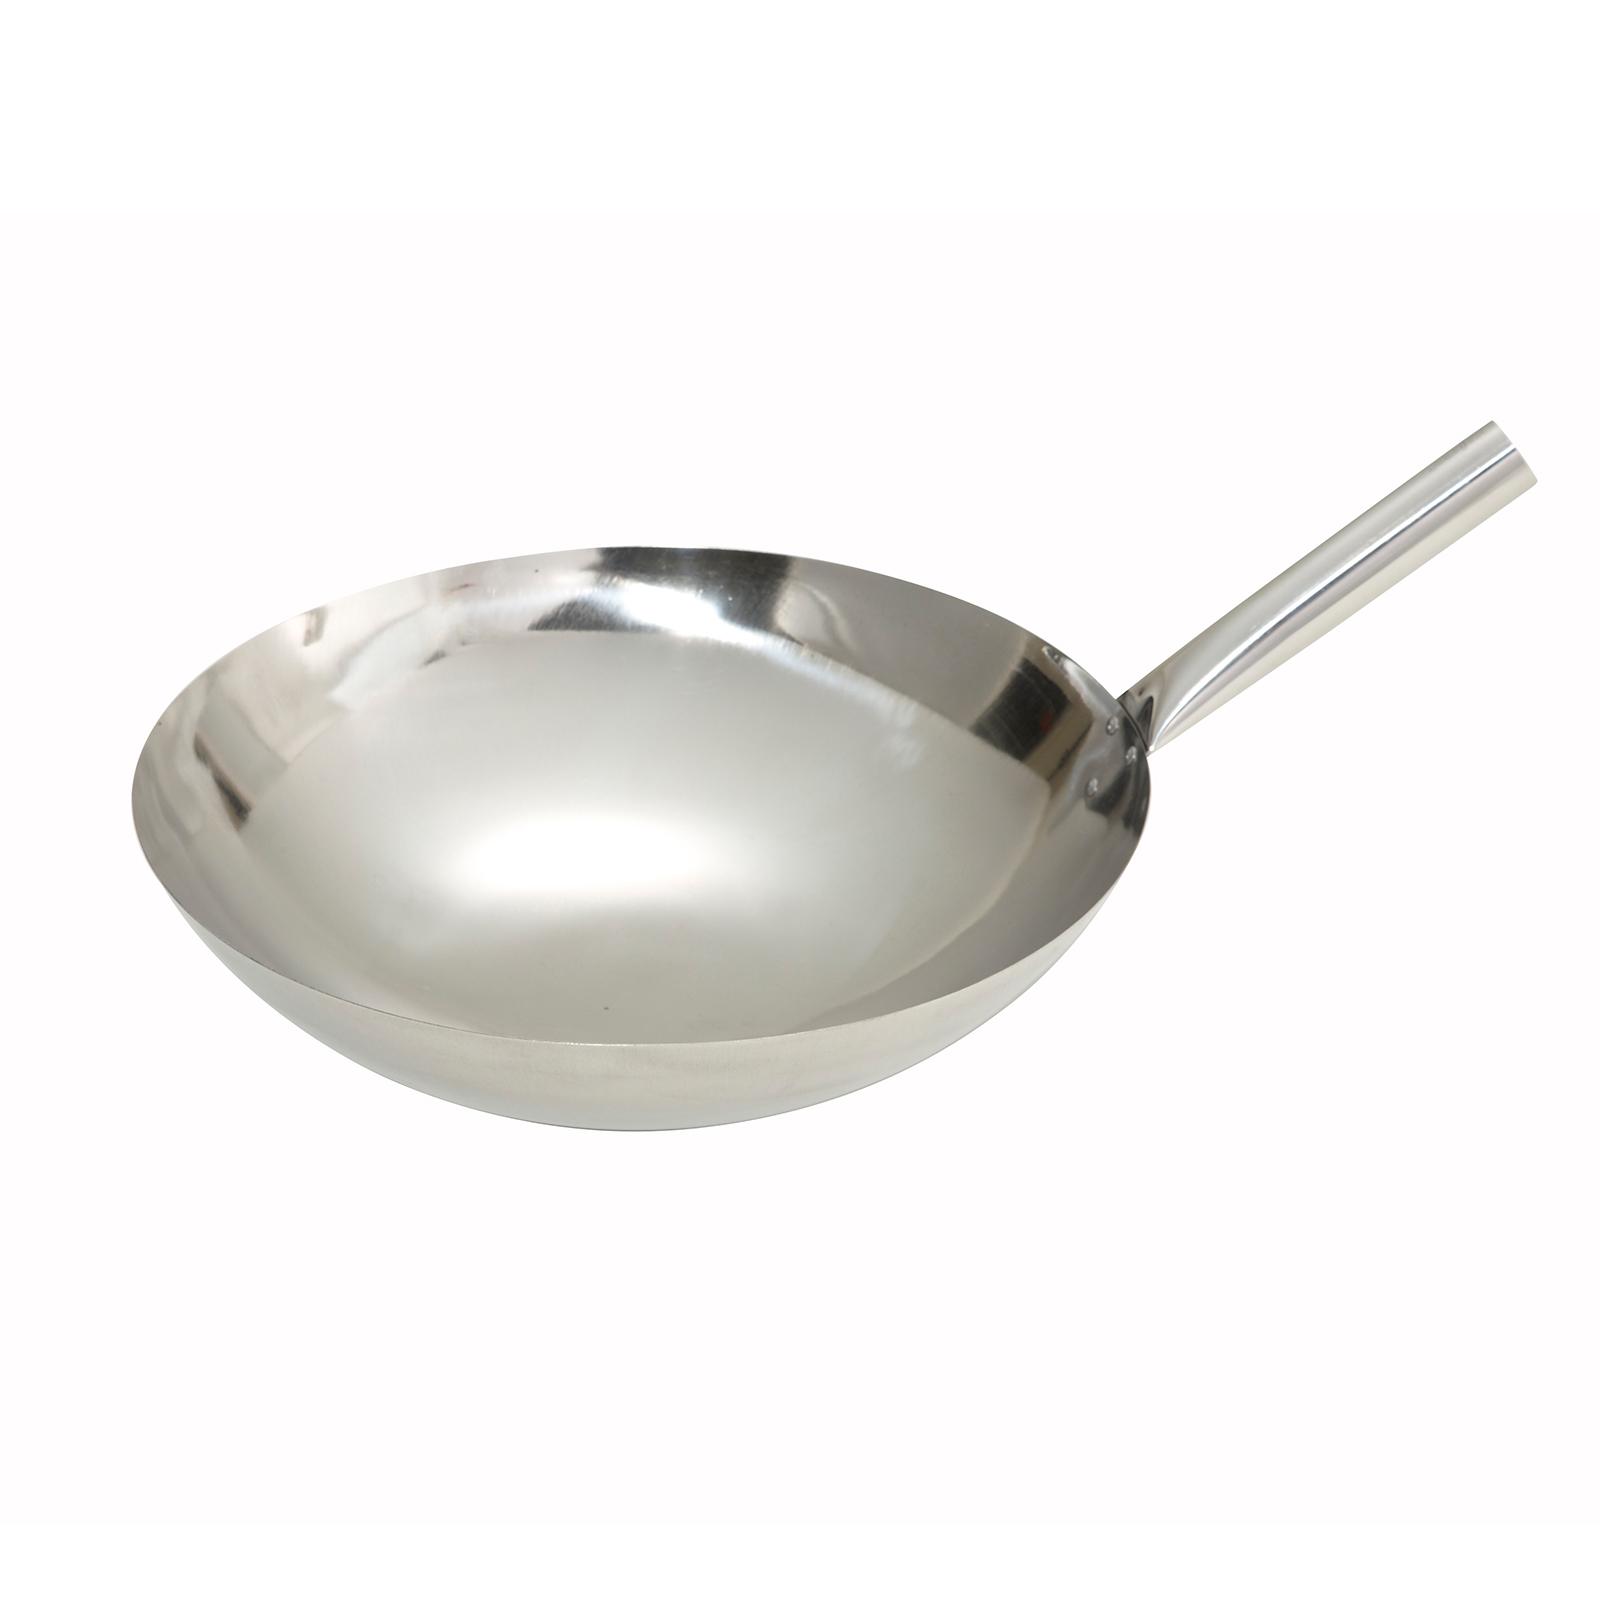 Winco WOK-14N wok pan